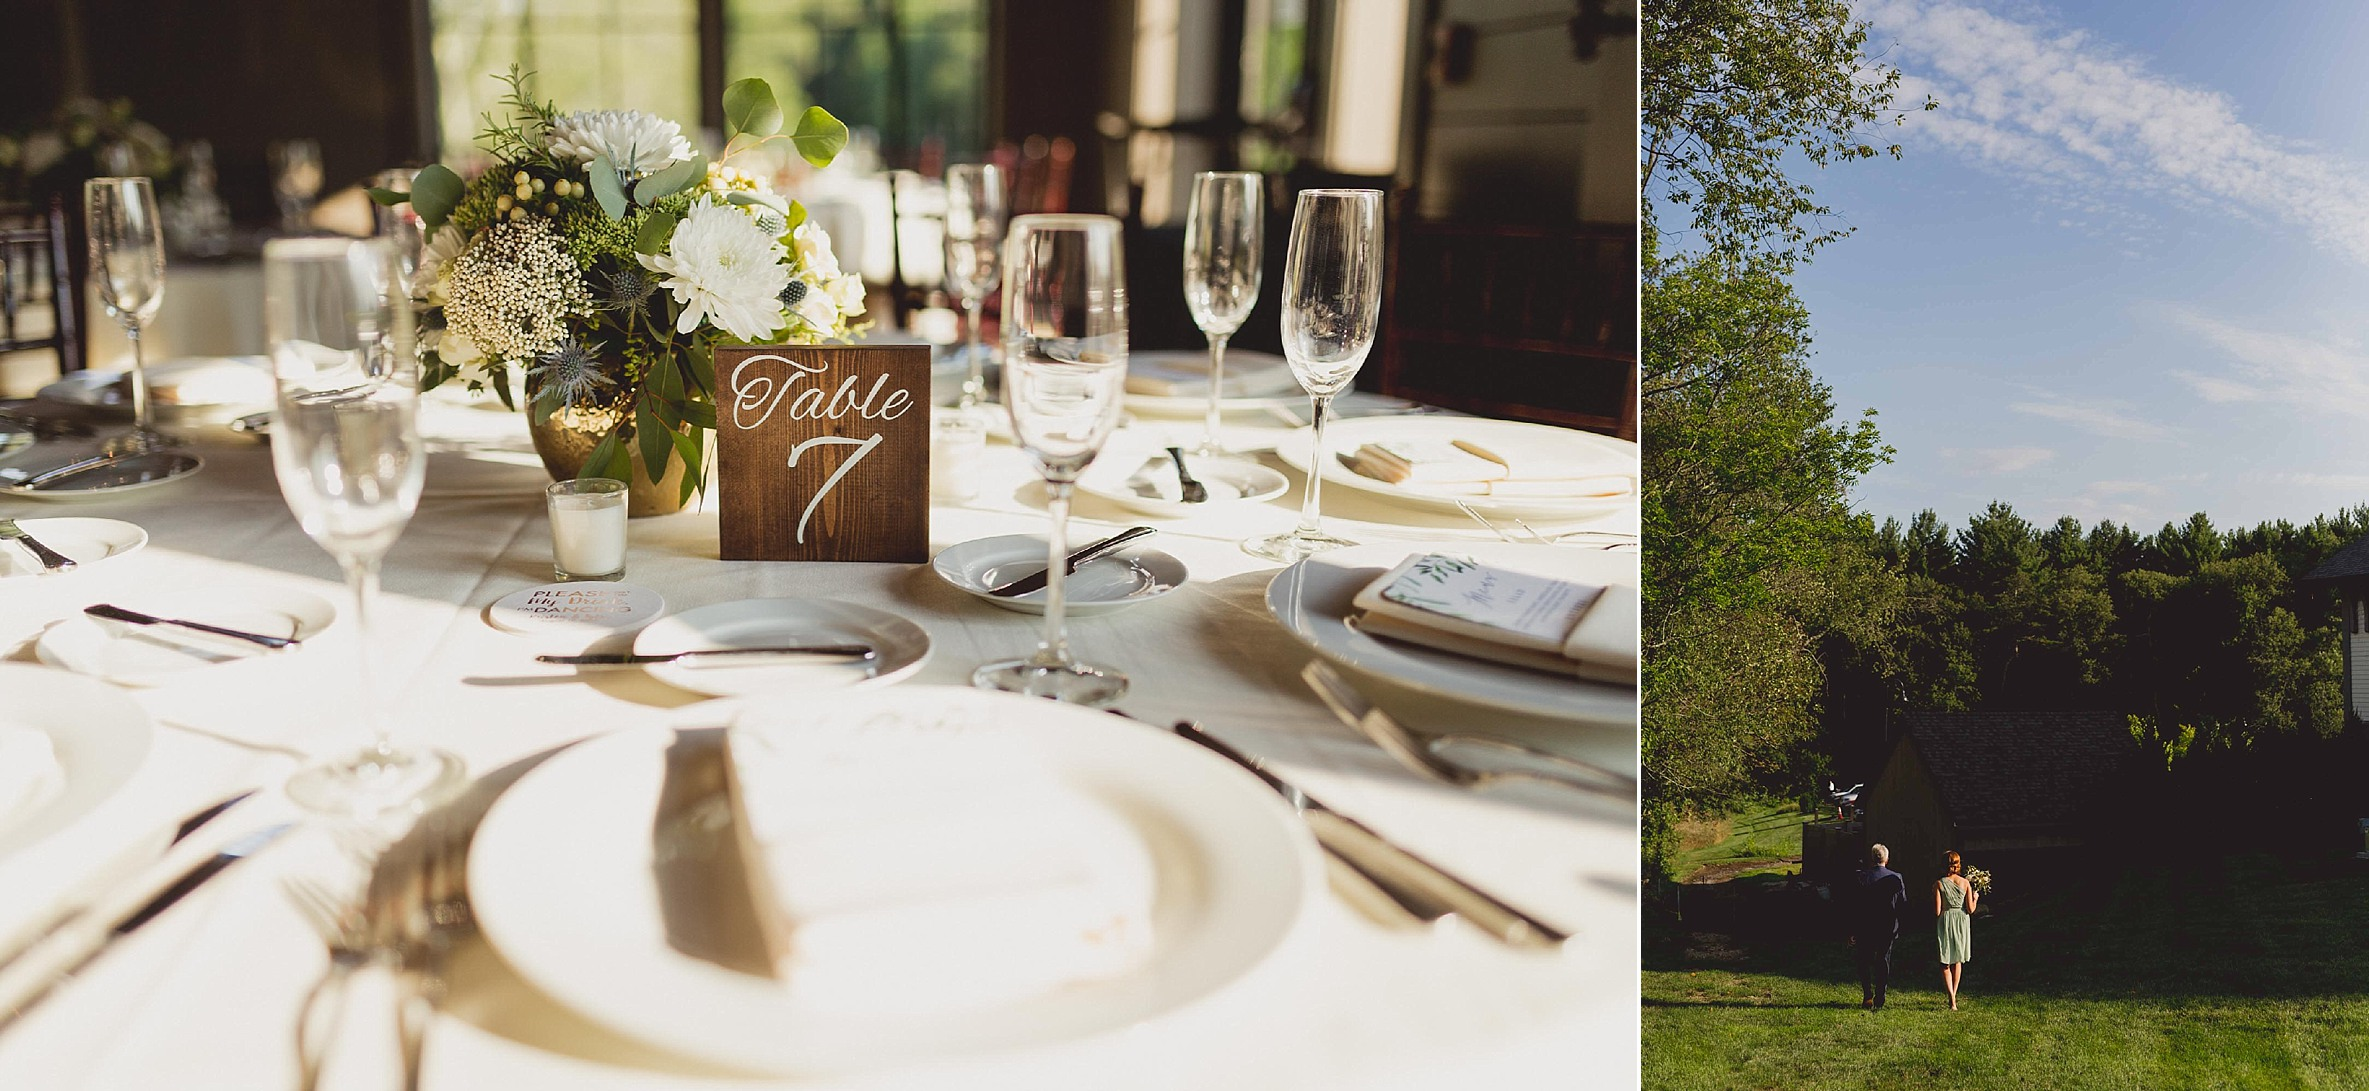 labelle winery wedding-39.jpg